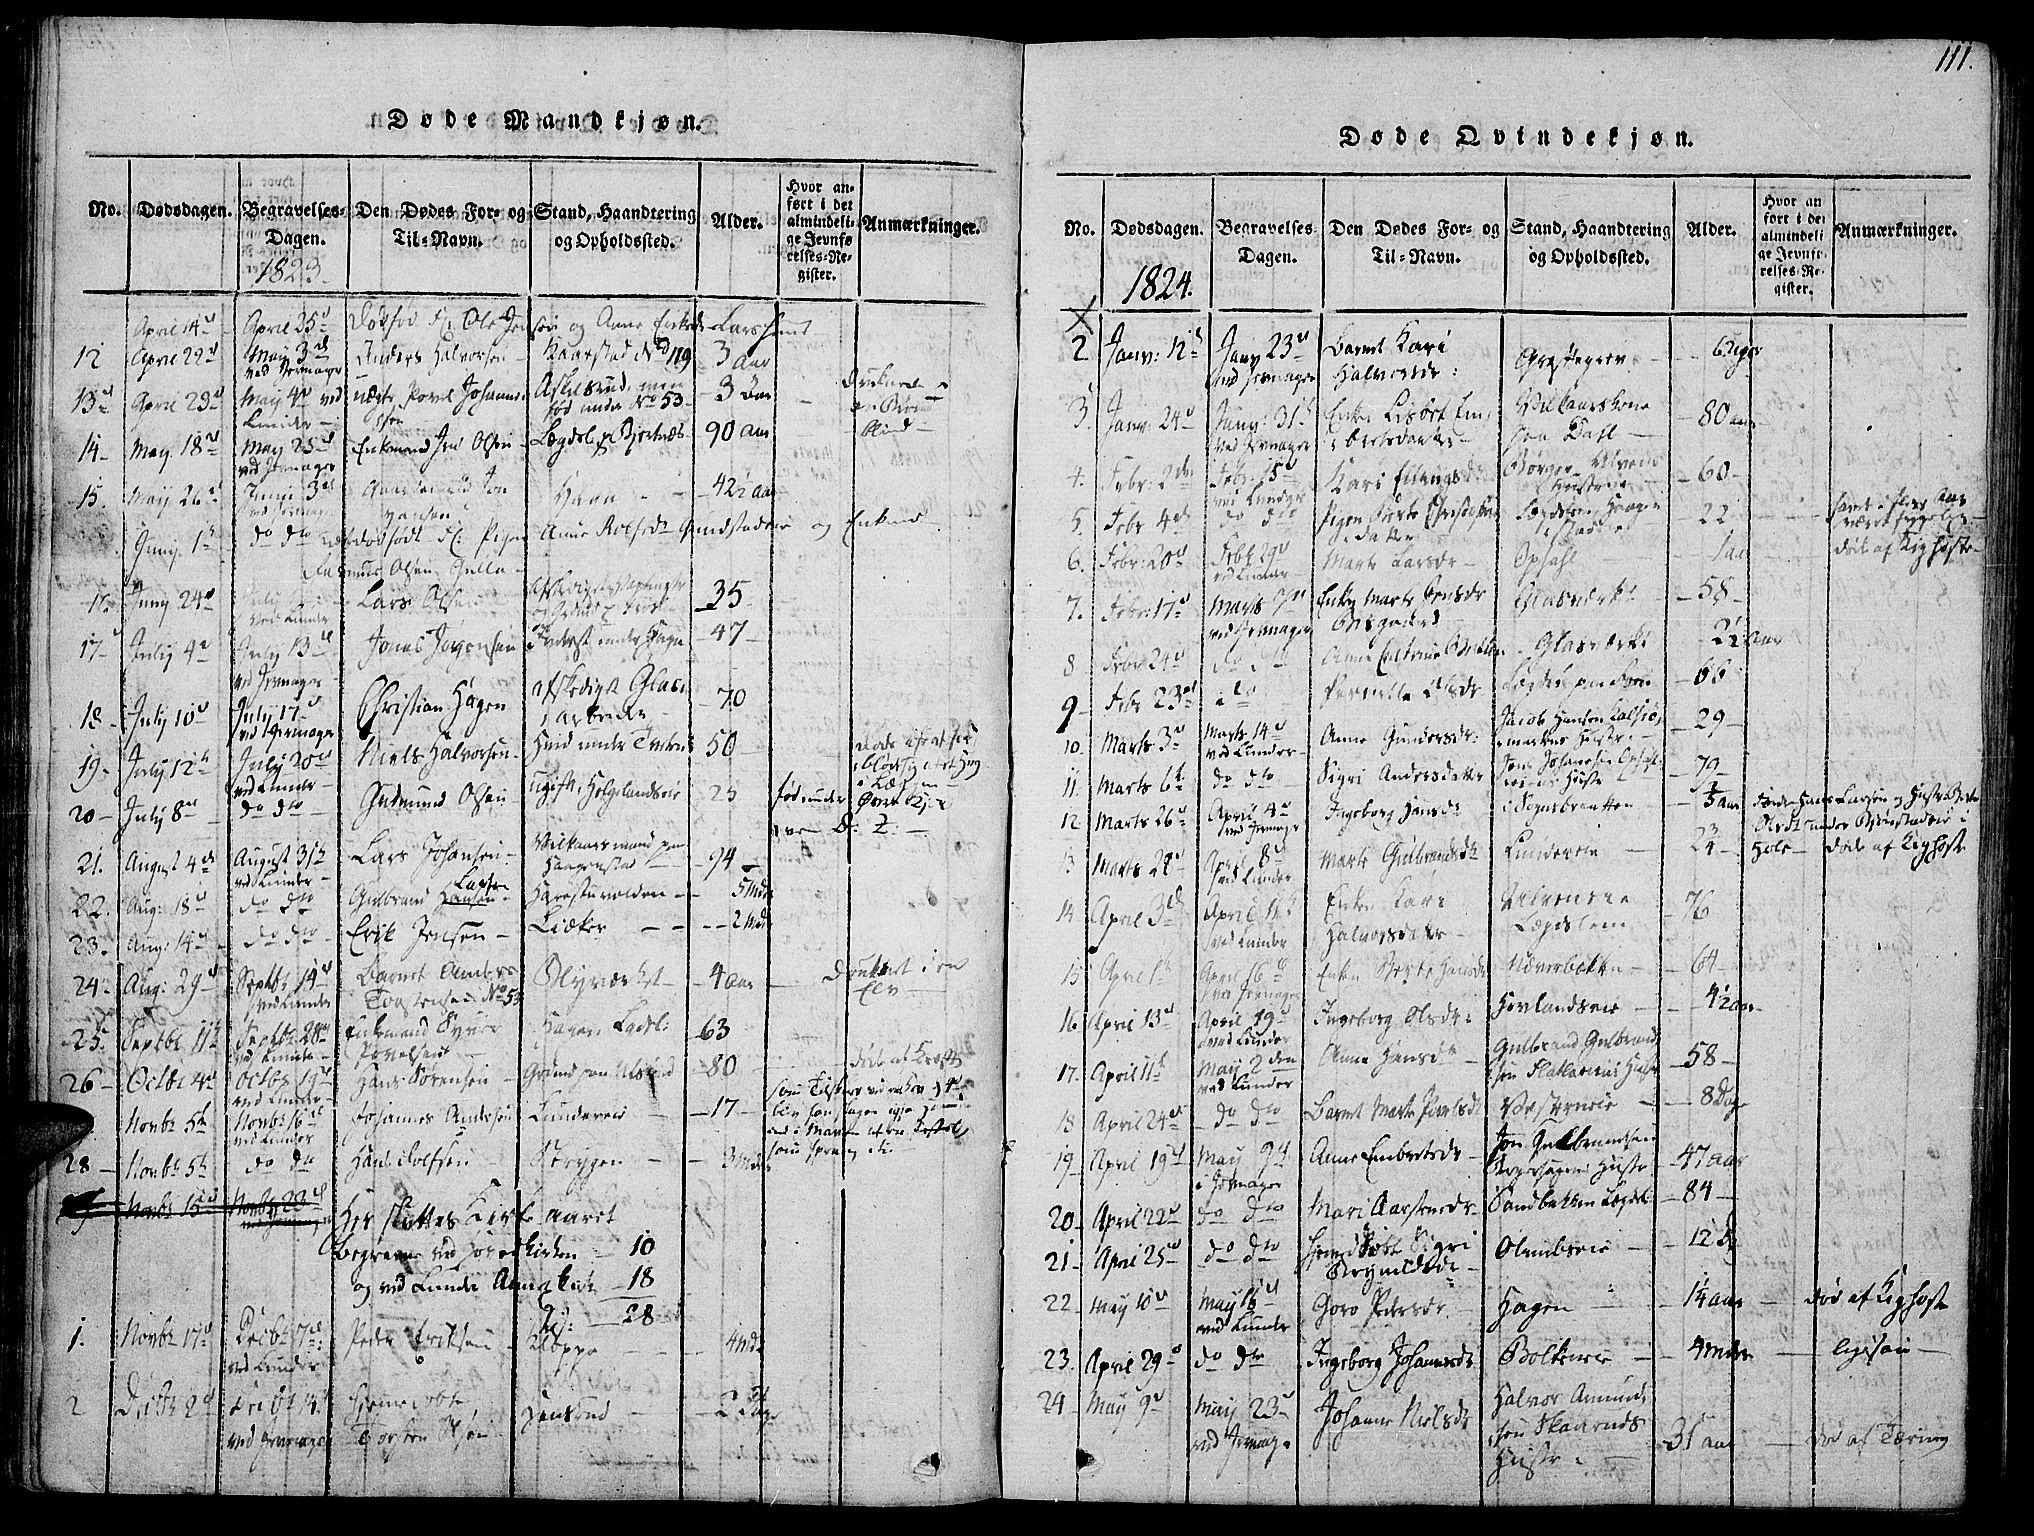 SAH, Jevnaker prestekontor, Ministerialbok nr. 5, 1815-1837, s. 111